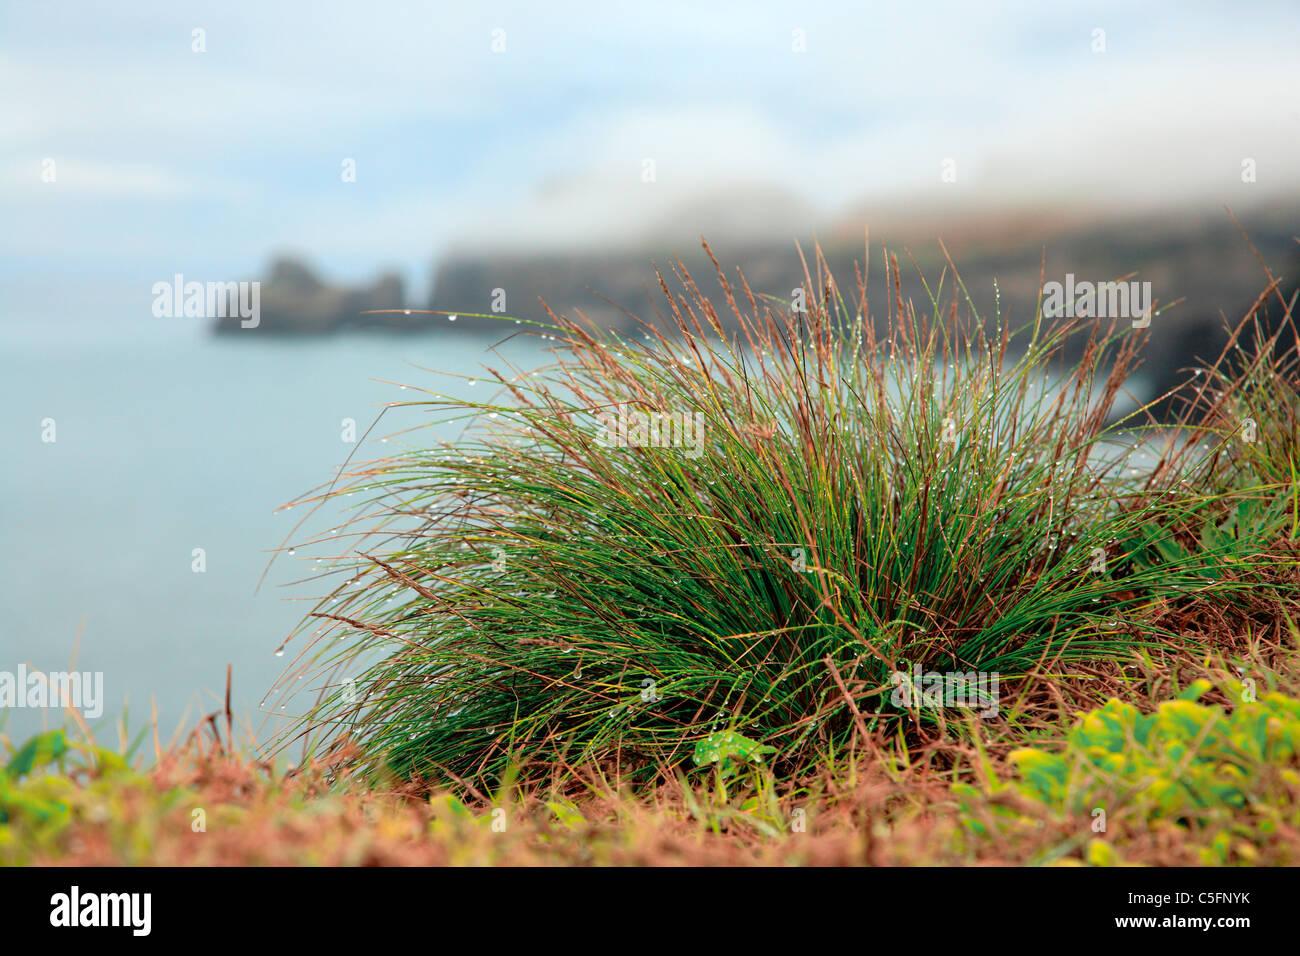 Flora Endémica de las Islas Azores: Festuca petraea Guthnick. Nombre portugués es 'bracel-da-rocha' Imagen De Stock